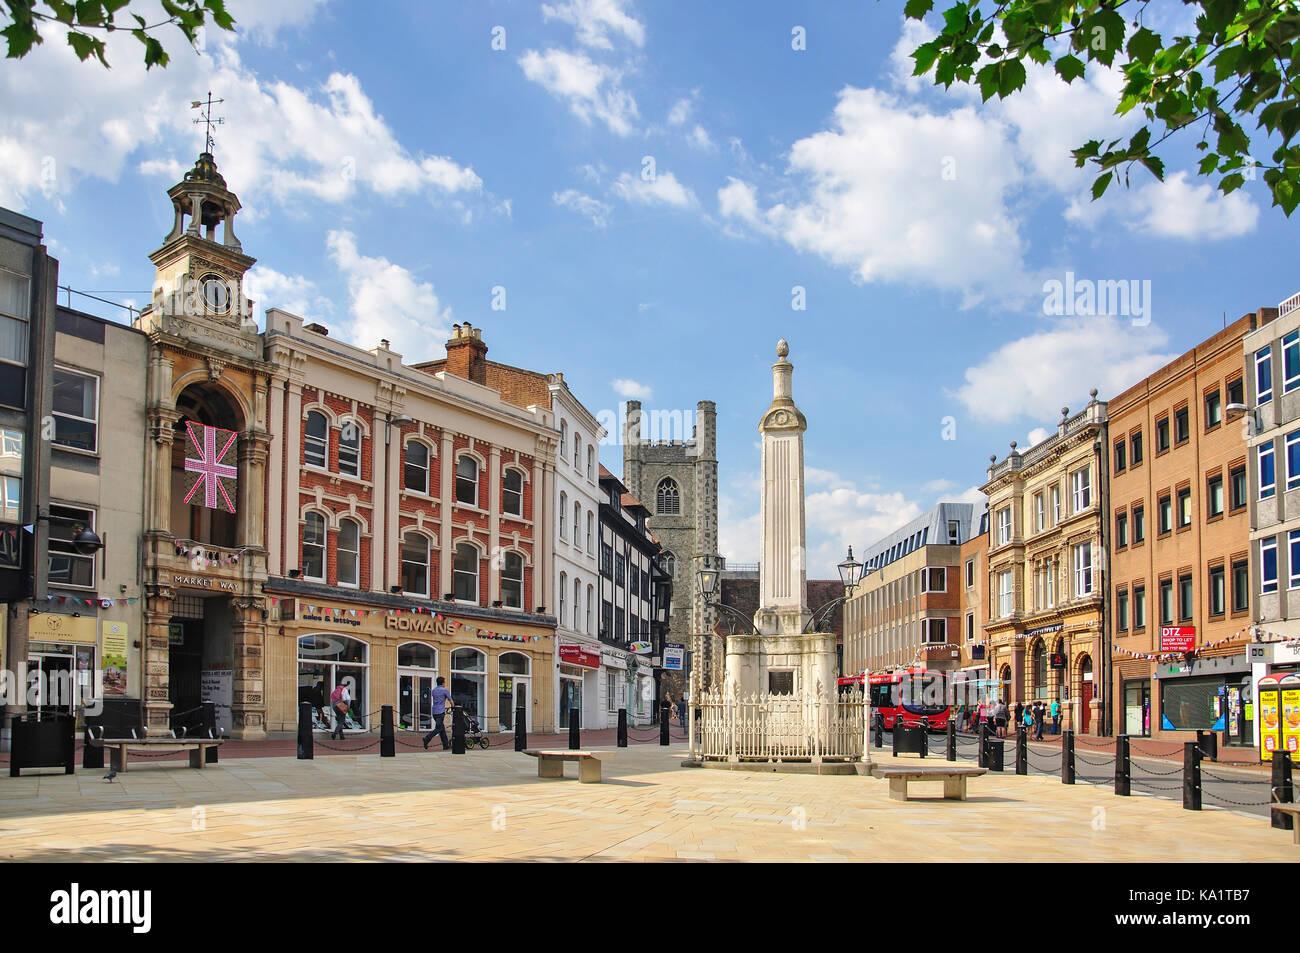 Market Place, High Street, Reading, Berkshire, England, United Kingdom - Stock Image